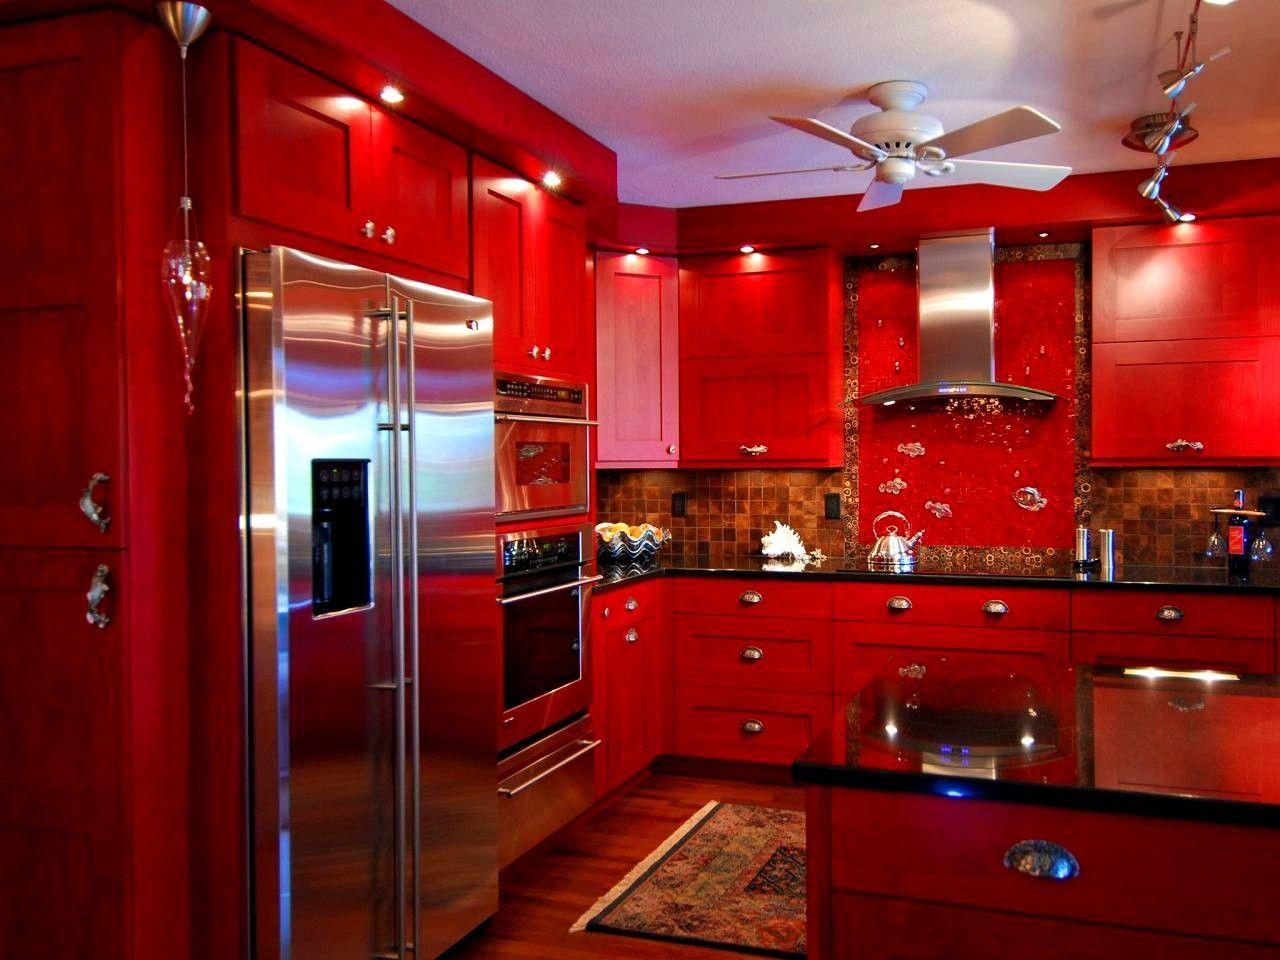 red kitchen backsplash photos tile lowe s tiles design on kitchen remodeling ideas and designs lowe s id=31179